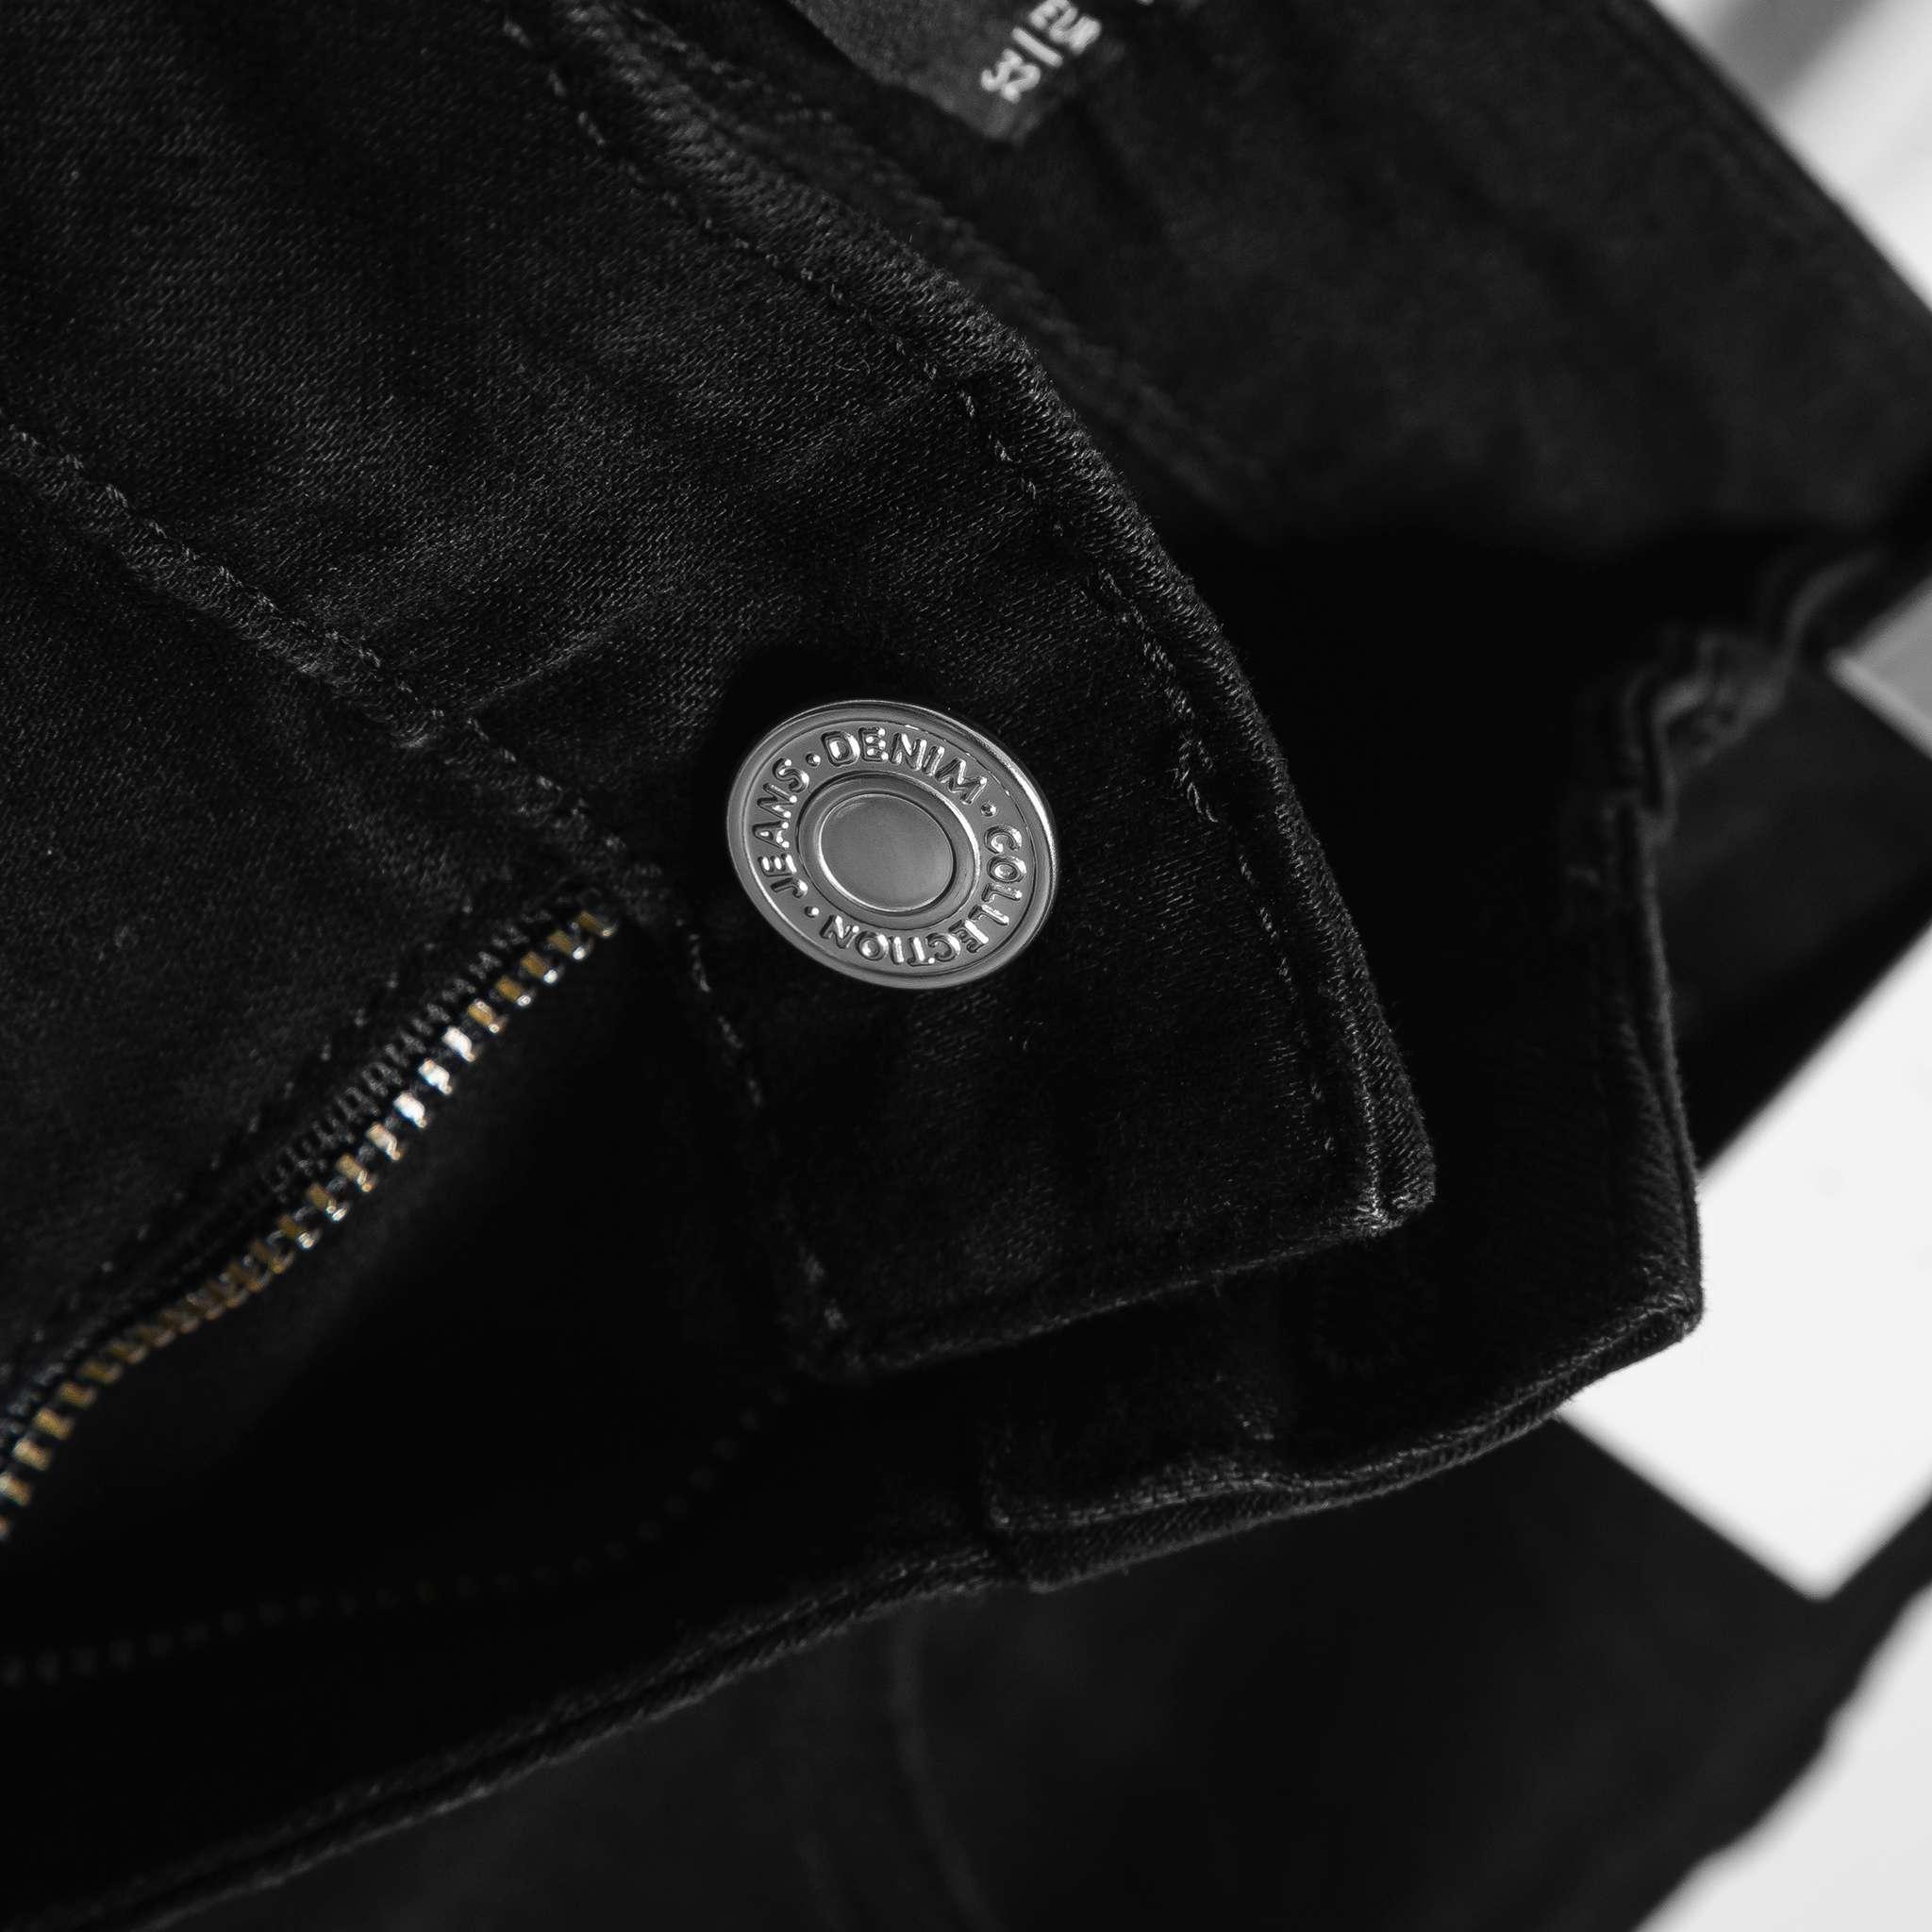 SP237 - Quần Jeans Skinny Black Ripped